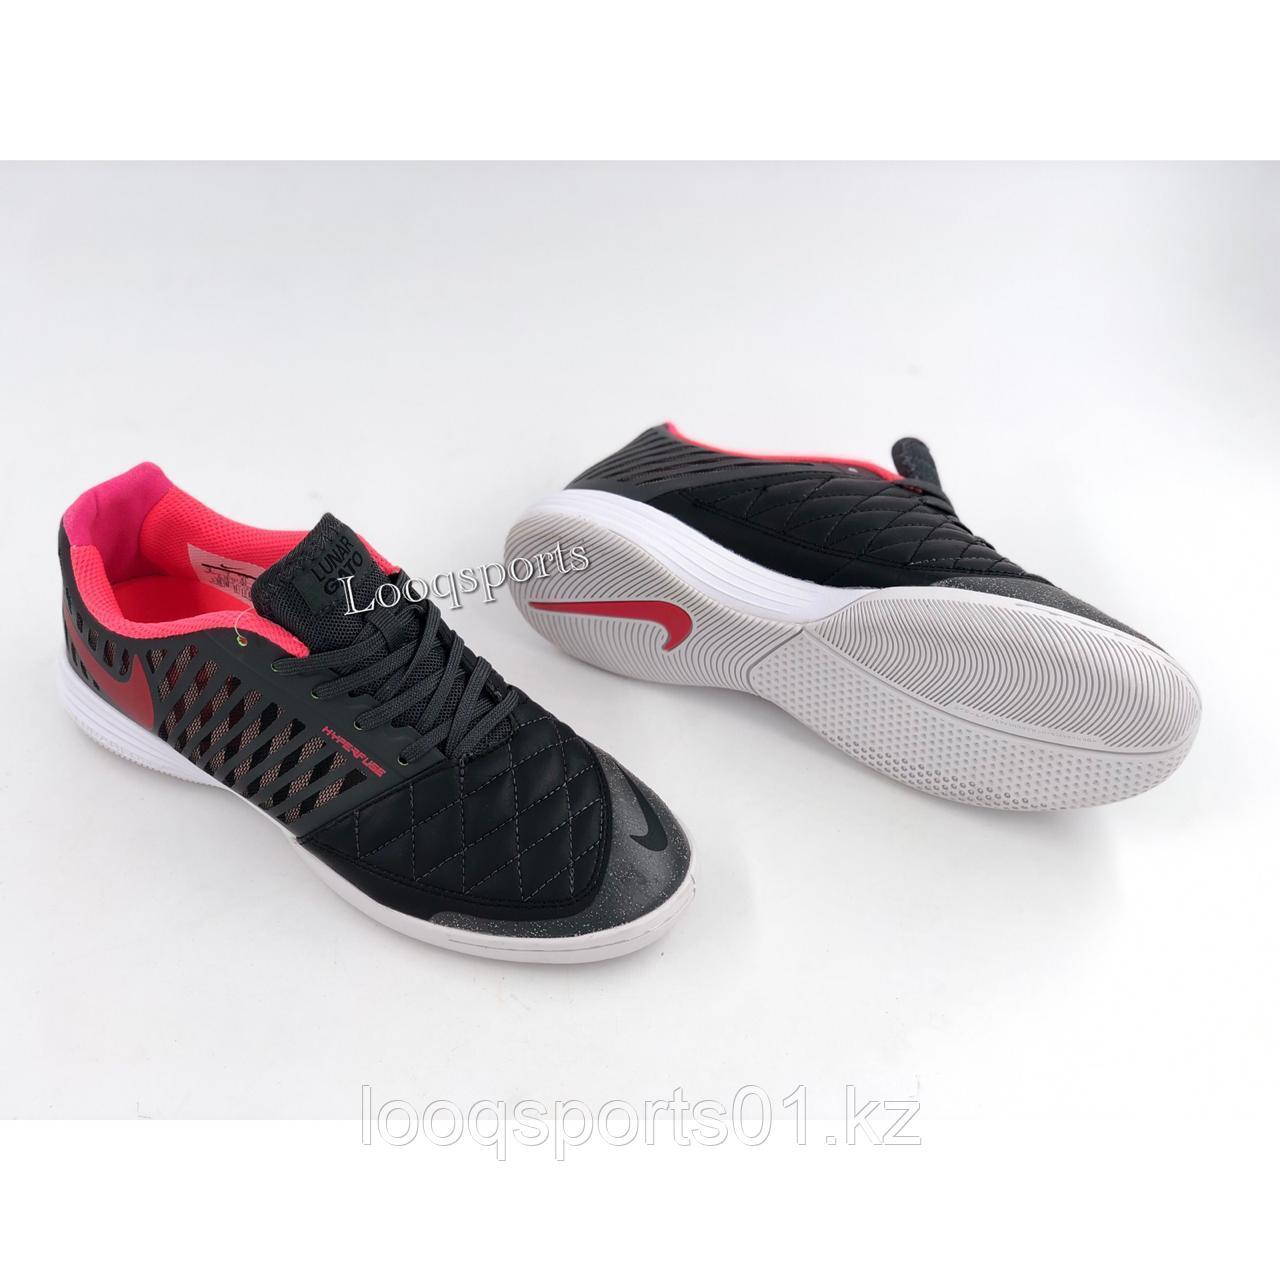 Футзалки Nike миники, зальники